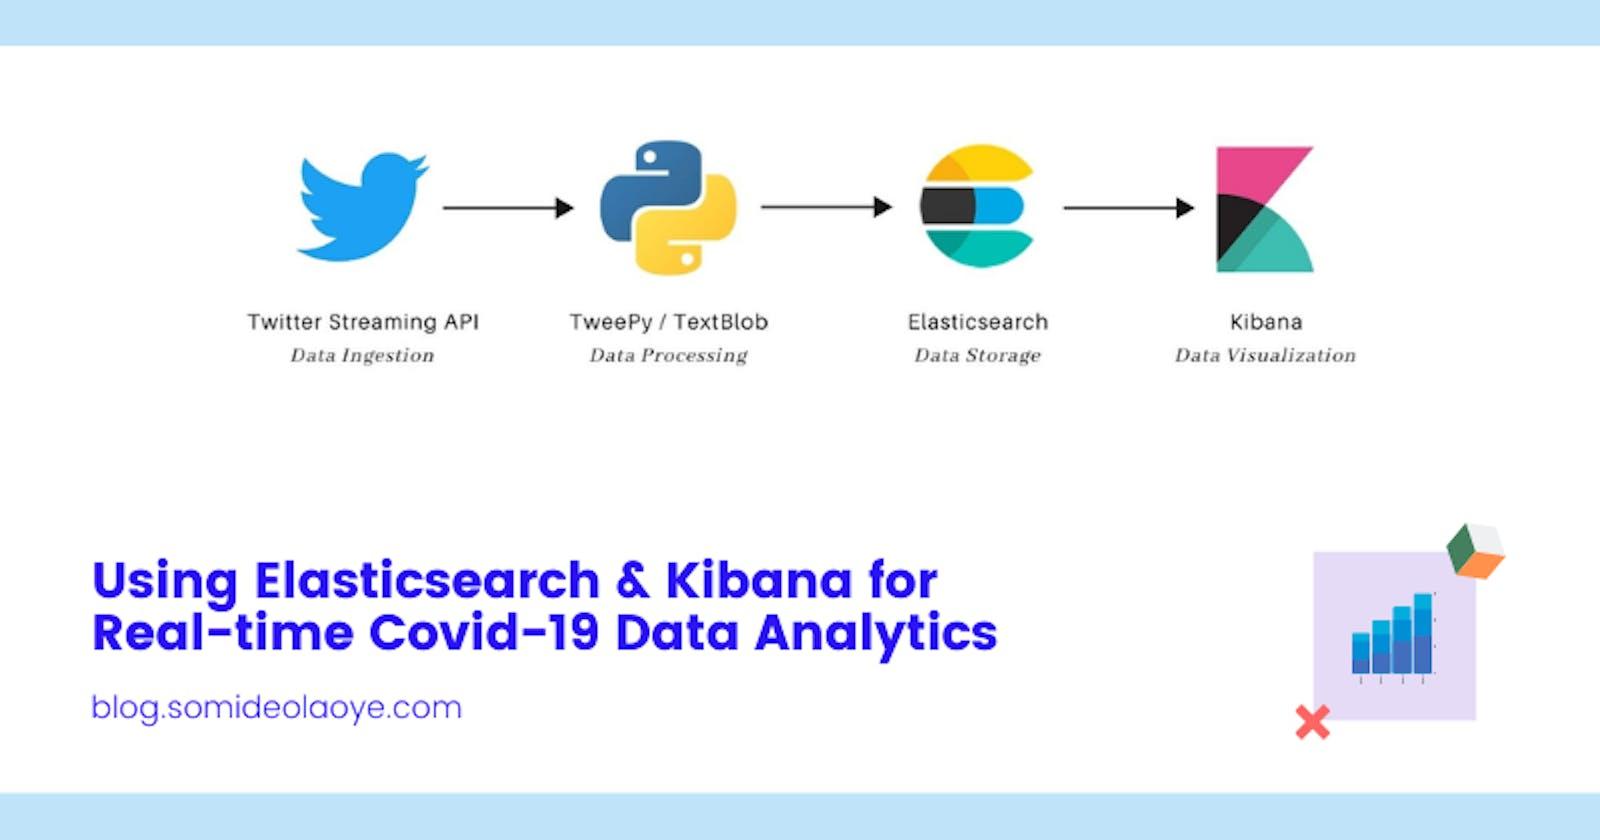 Using Elasticsearch & Kibana for Real-time Covid-19 Data Analytics